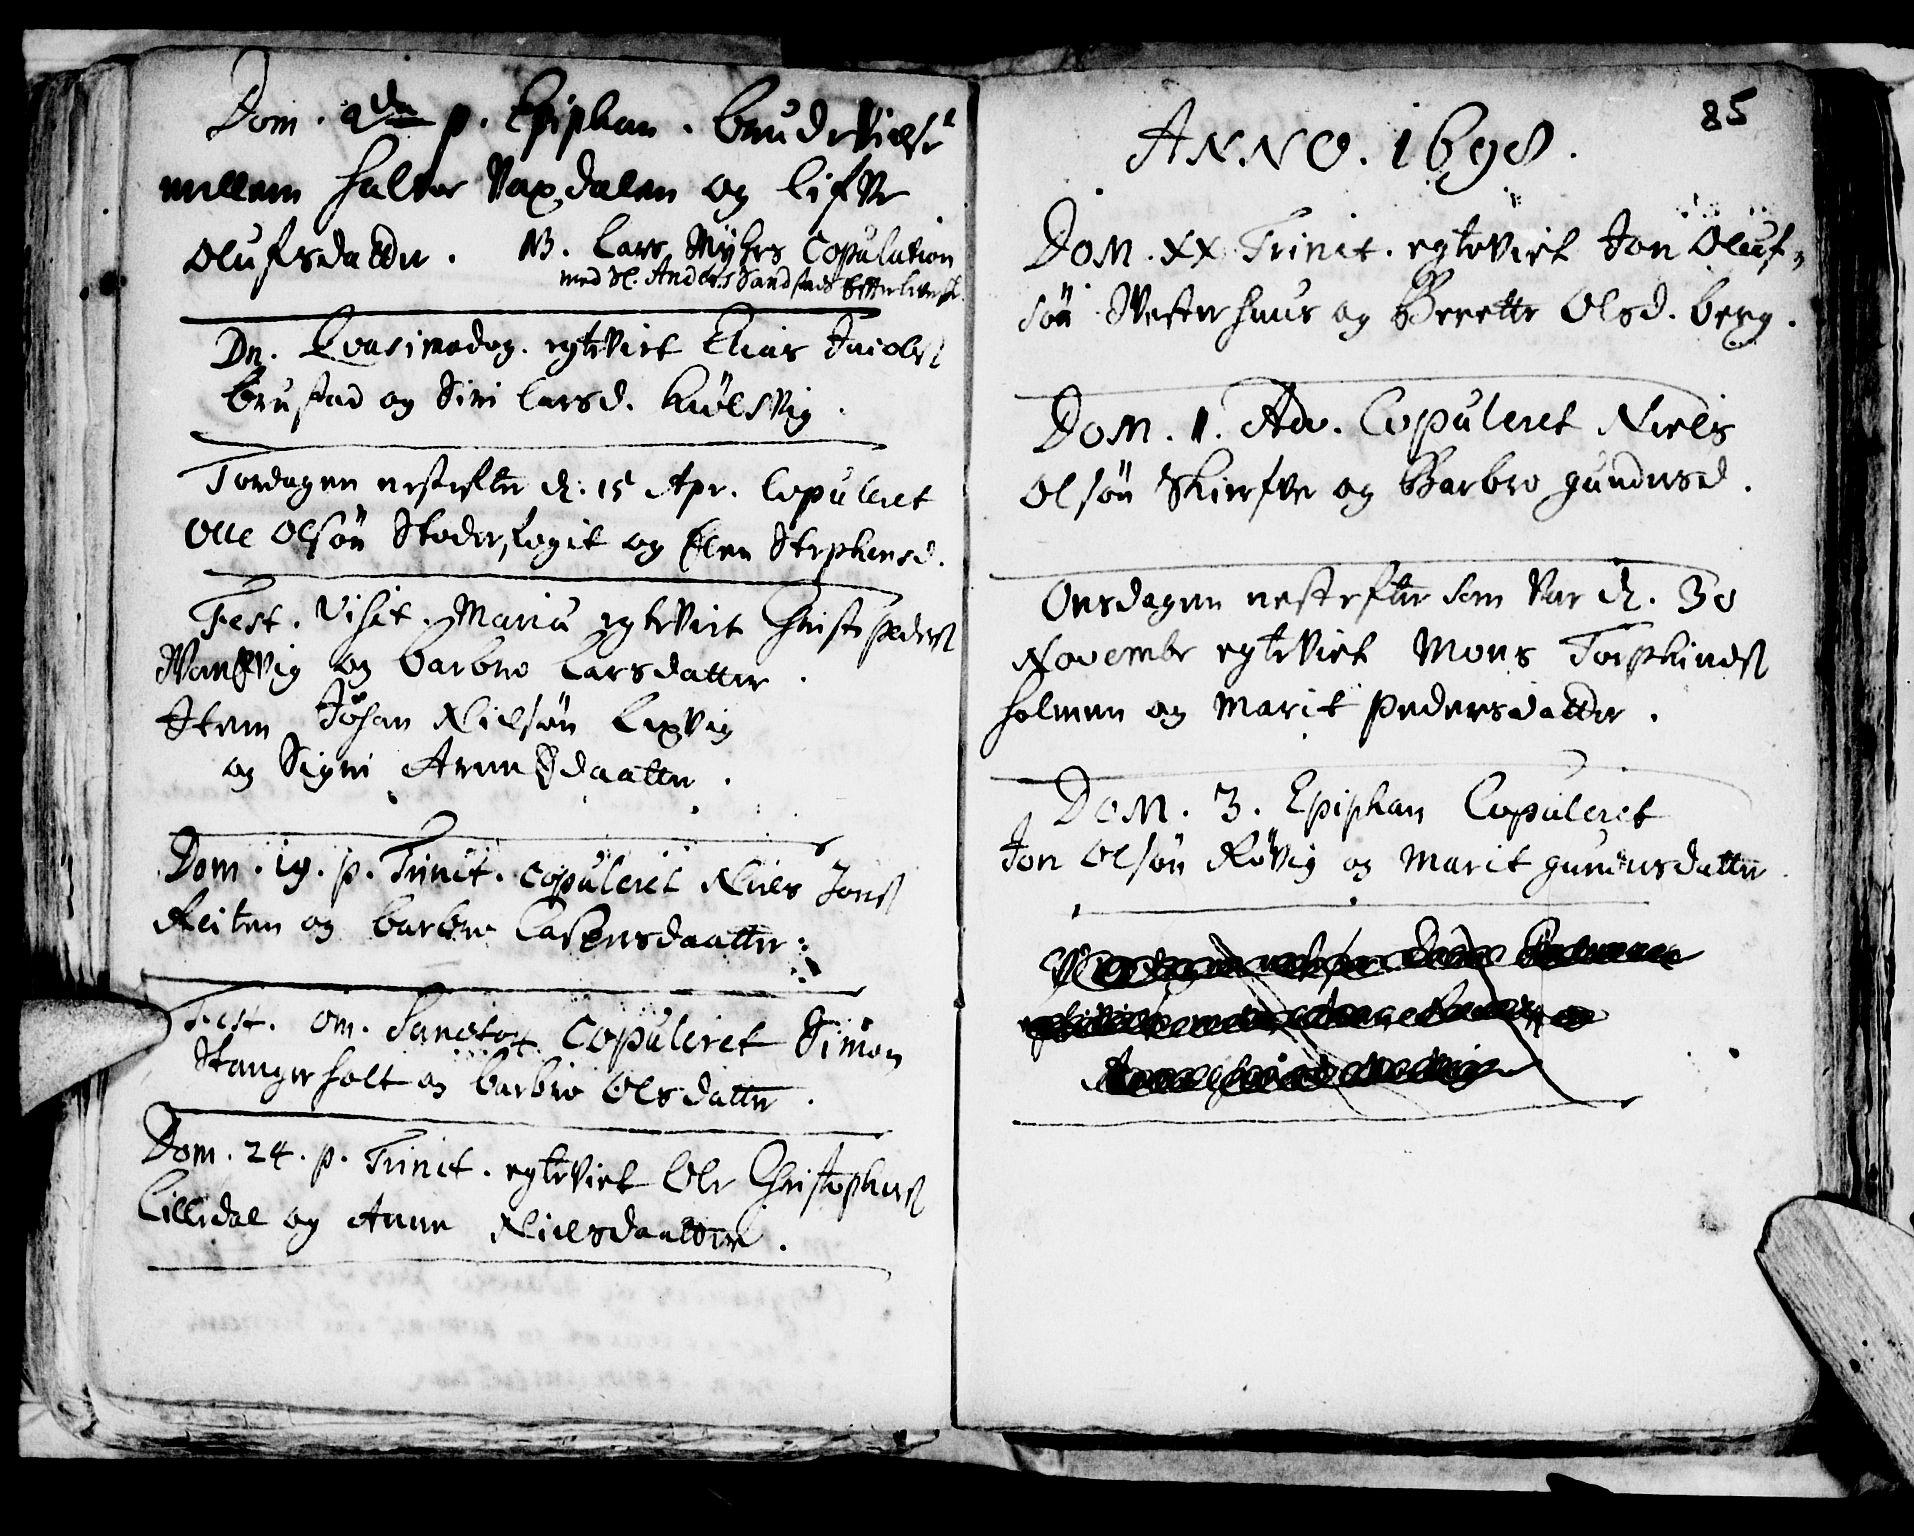 SAT, Ministerialprotokoller, klokkerbøker og fødselsregistre - Nord-Trøndelag, 722/L0214: Ministerialbok nr. 722A01, 1692-1718, s. 85a